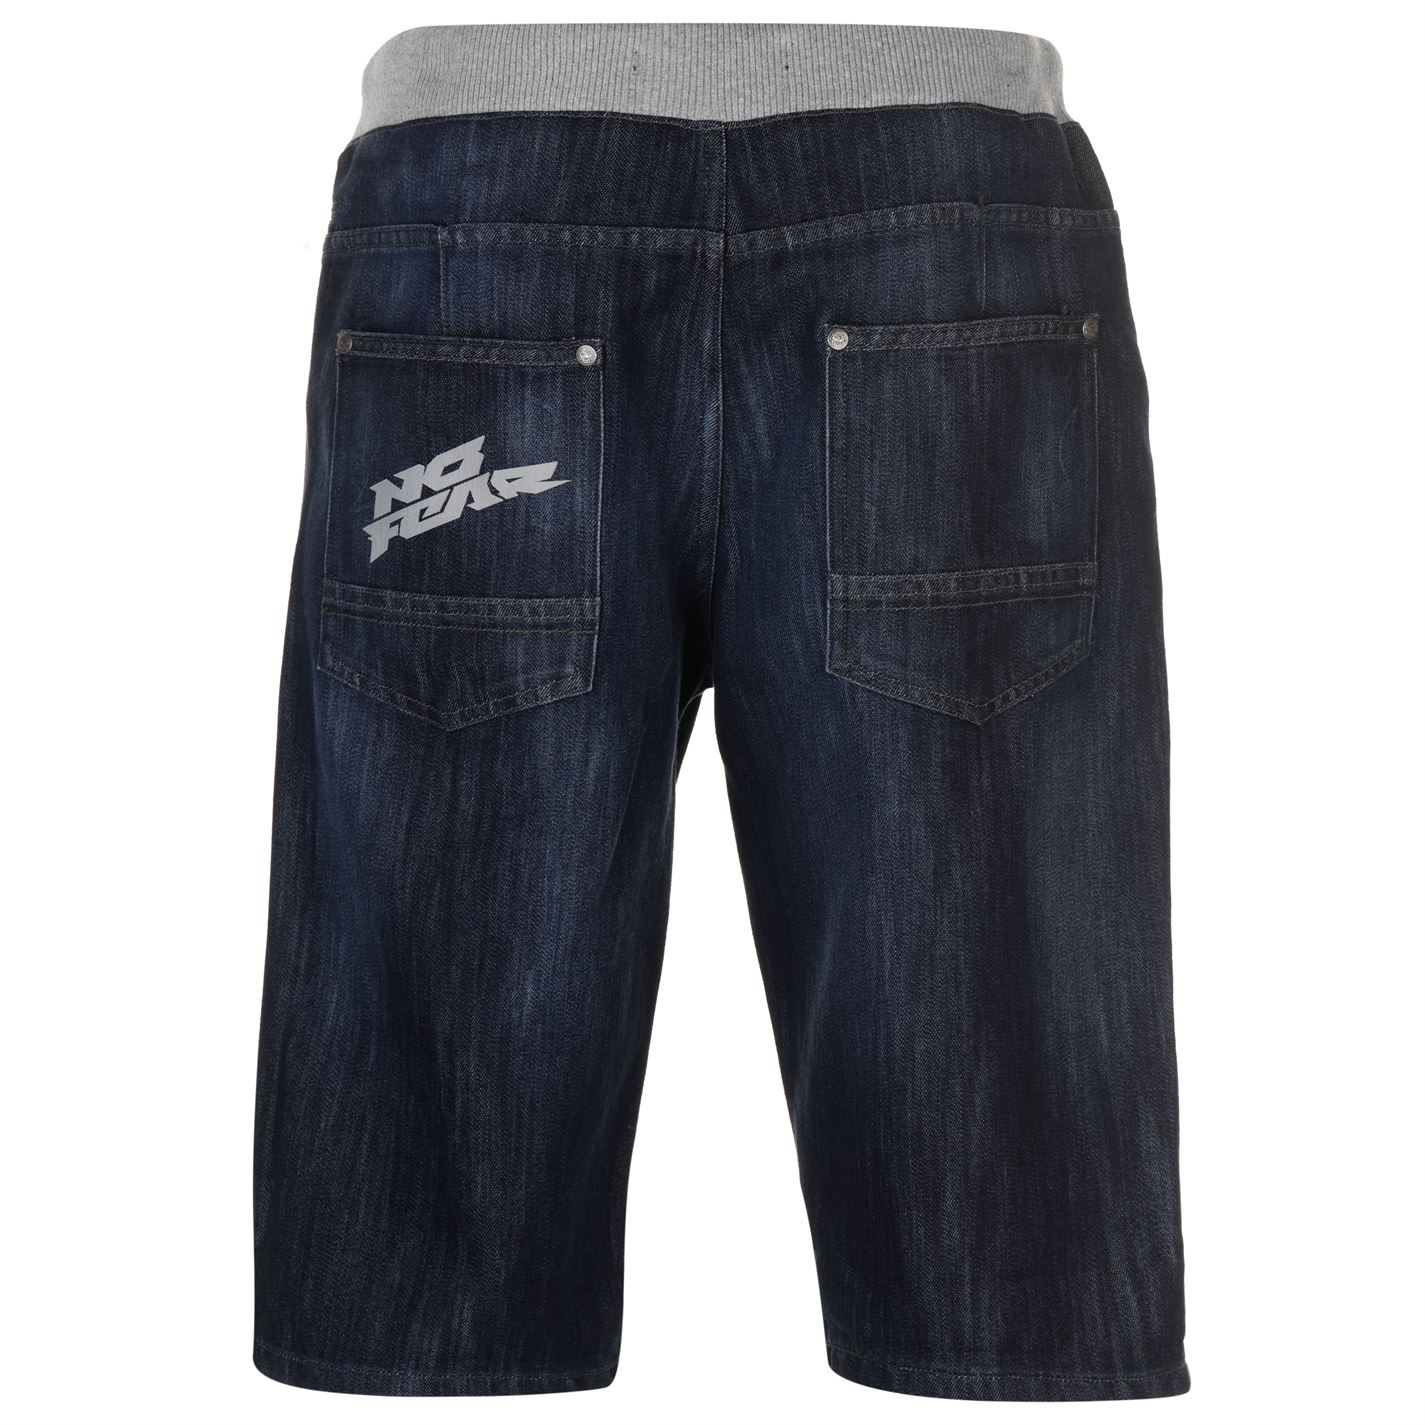 No-Fear-Mens-Denim-Shorts-Pants-Trousers-Bottoms-Zip-Warm-Drawstring-Elasticated thumbnail 4